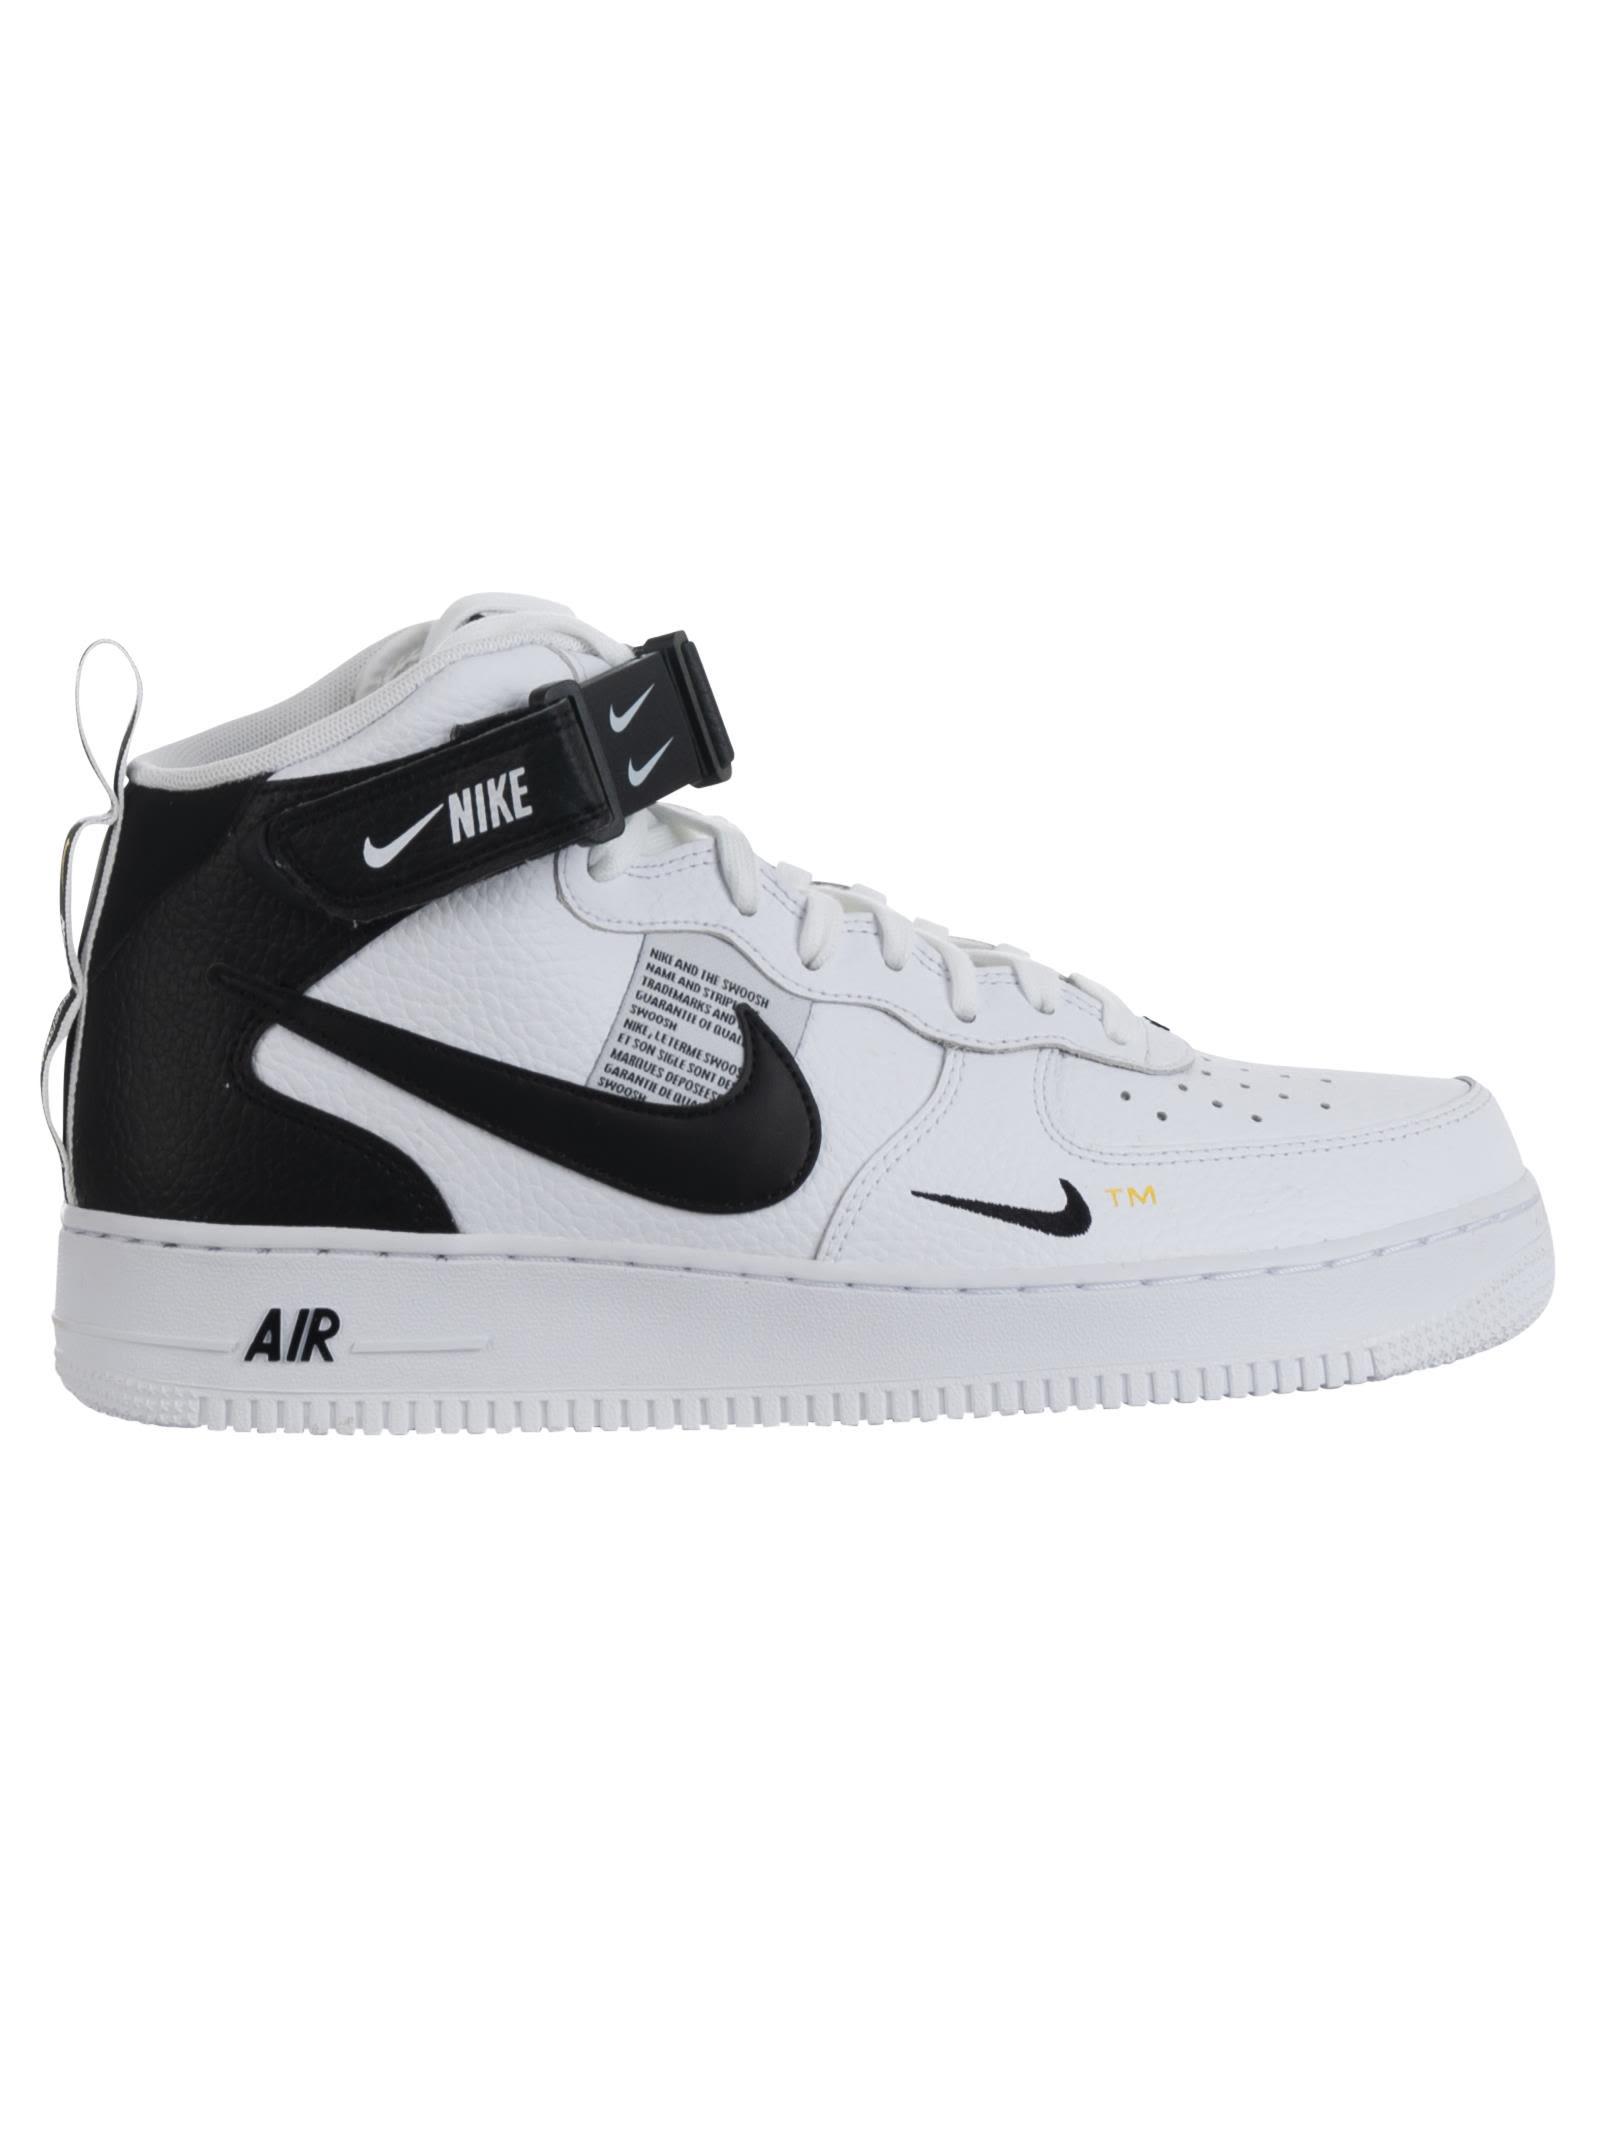 air force 1 bianco nere